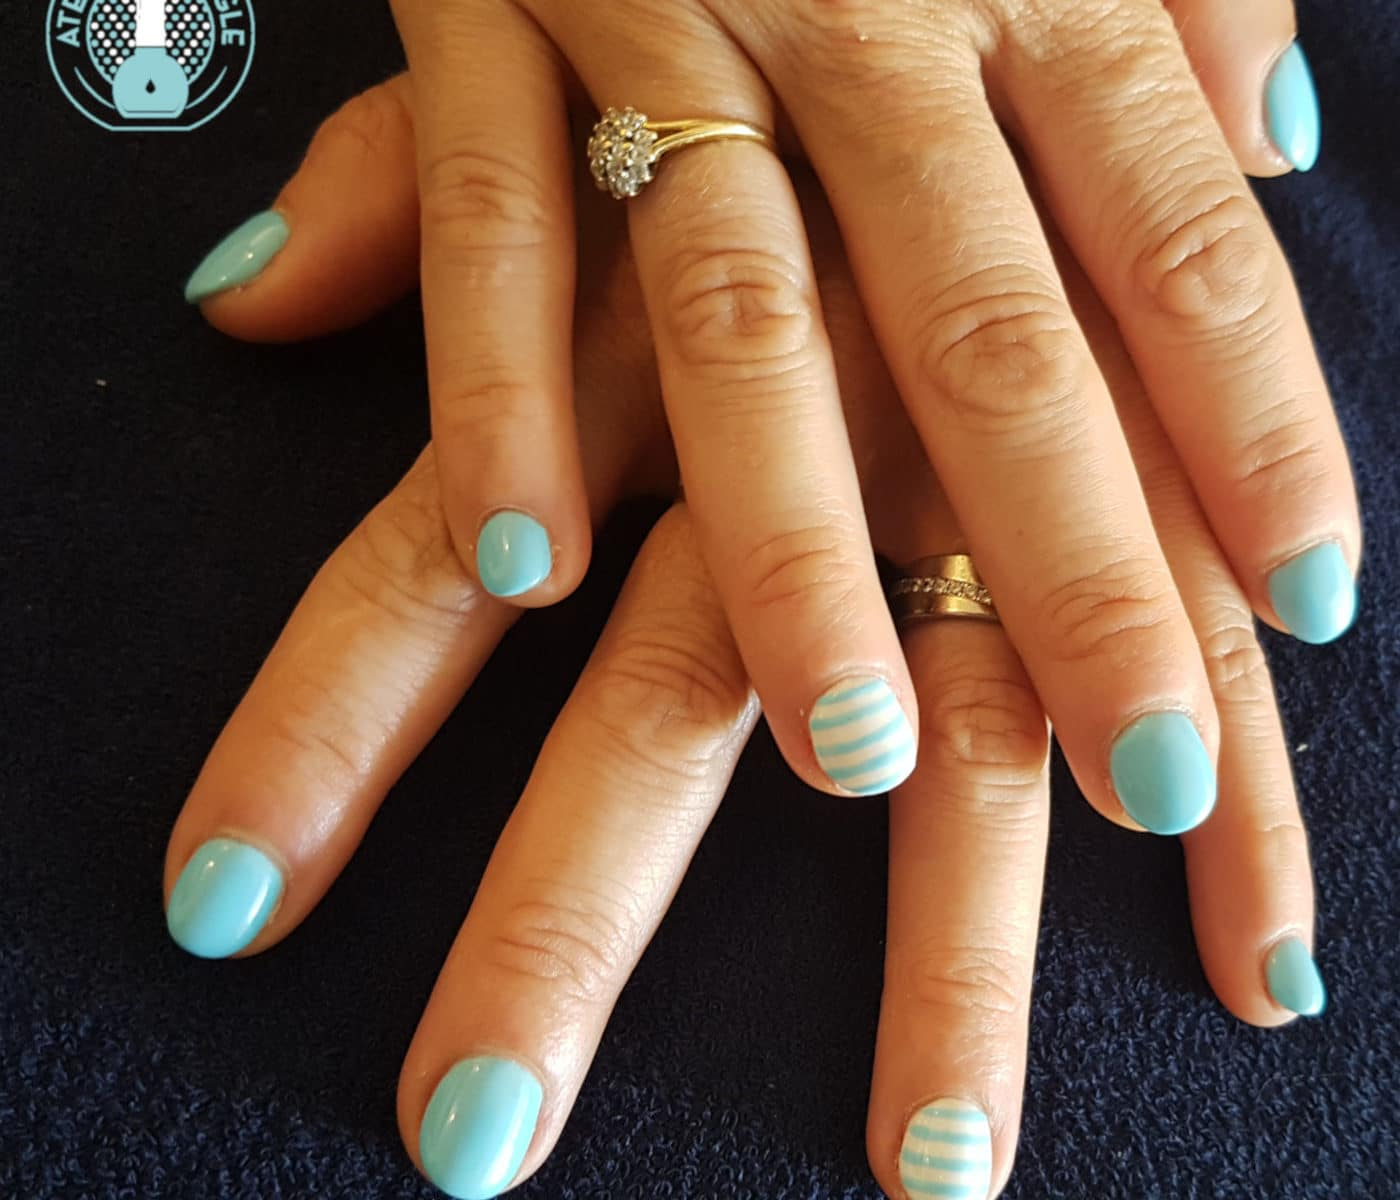 Nail art representant une mariniere